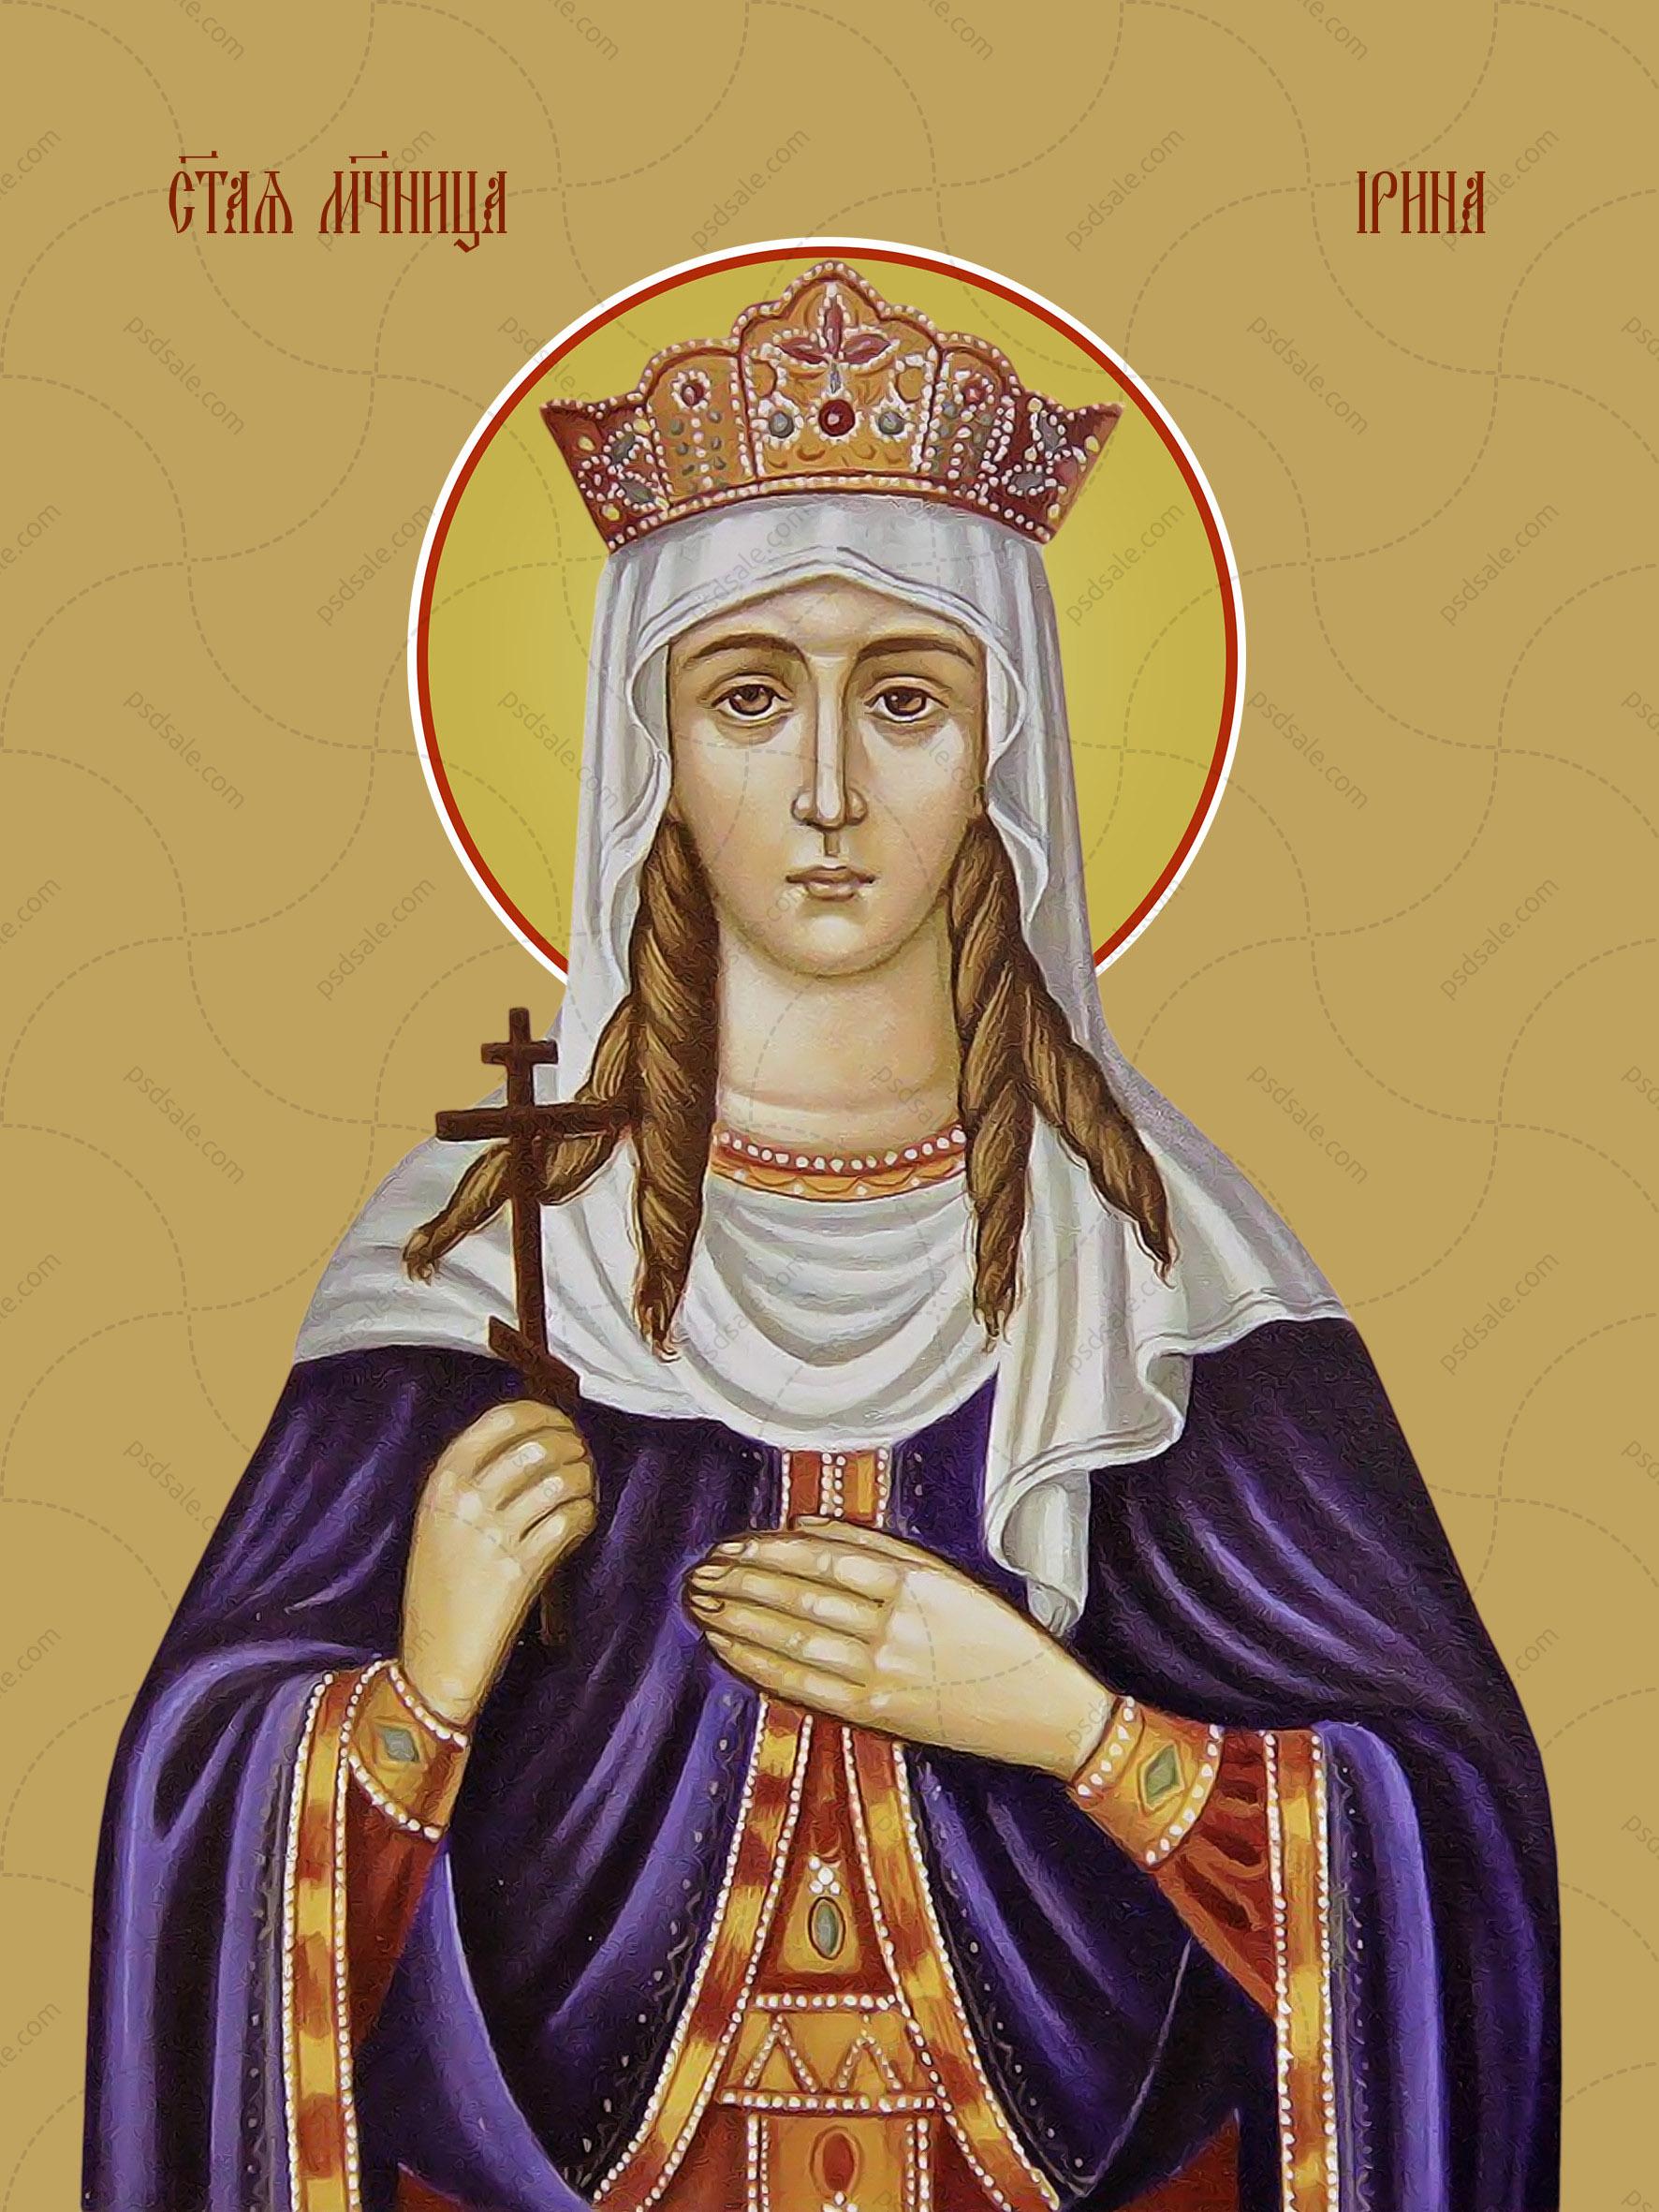 Ирина Македонская, мученица